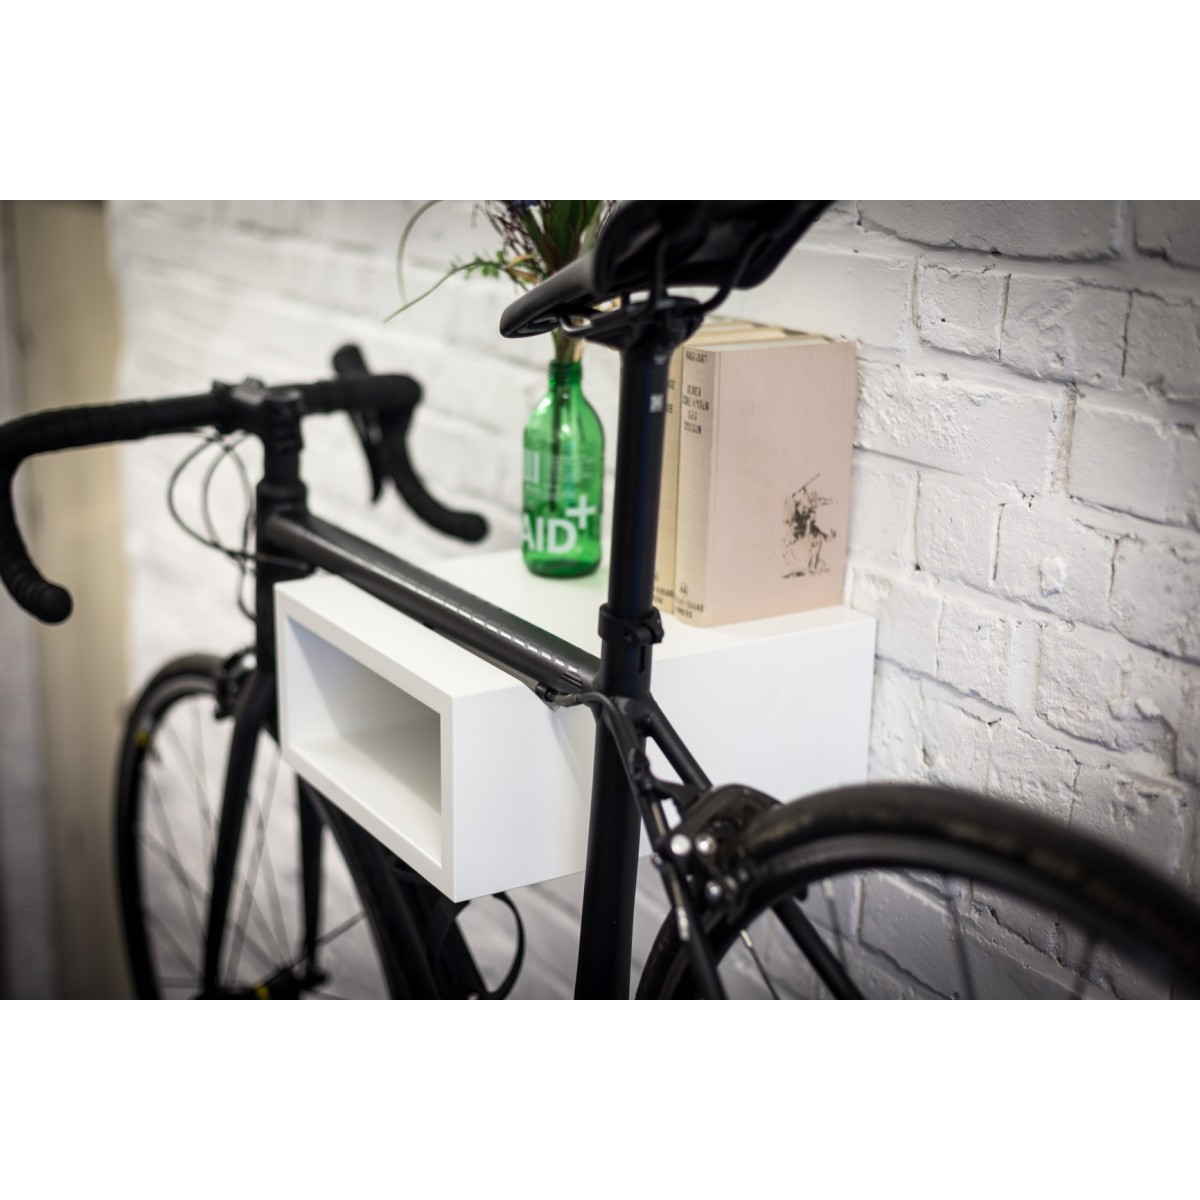 OSKAR | Fahrrad Wandhalterung aus Holz | Fahrradwandhalter